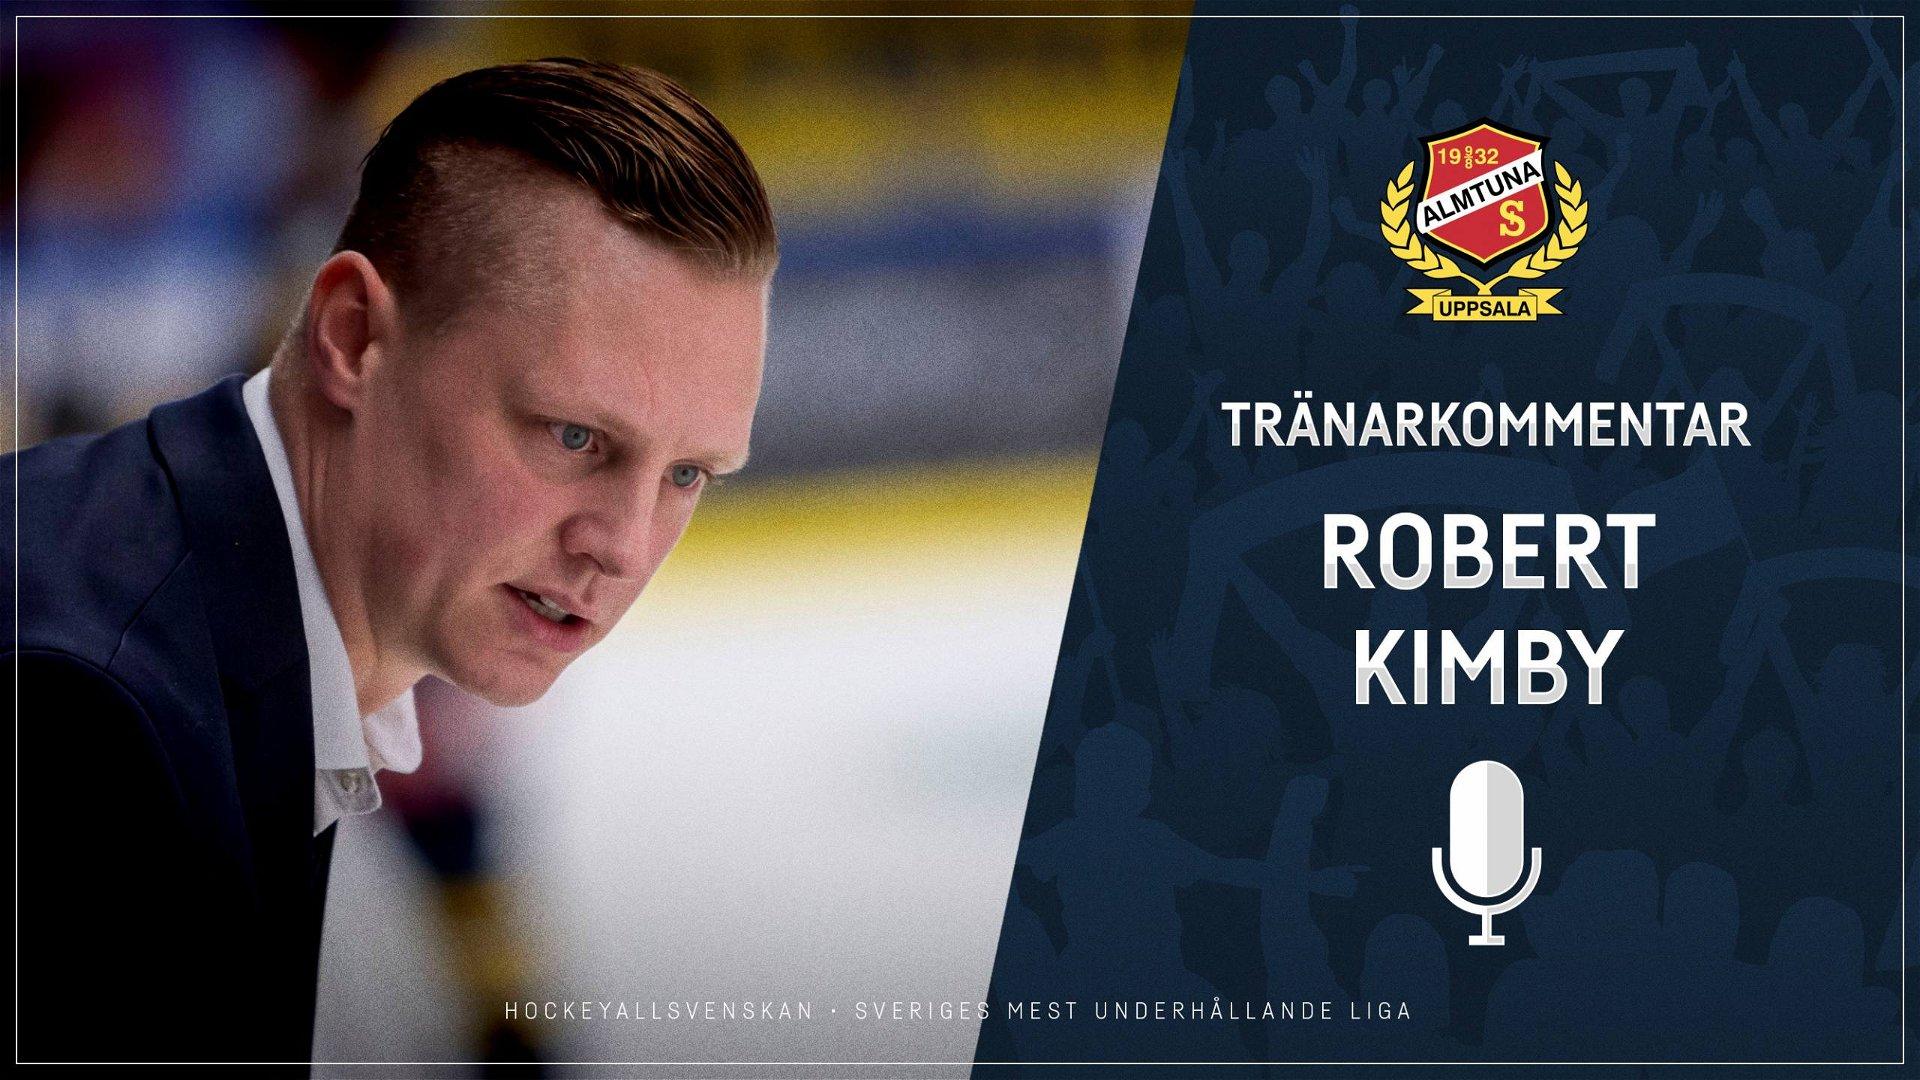 2021-02-23 Segerintervju: Robert Kimby